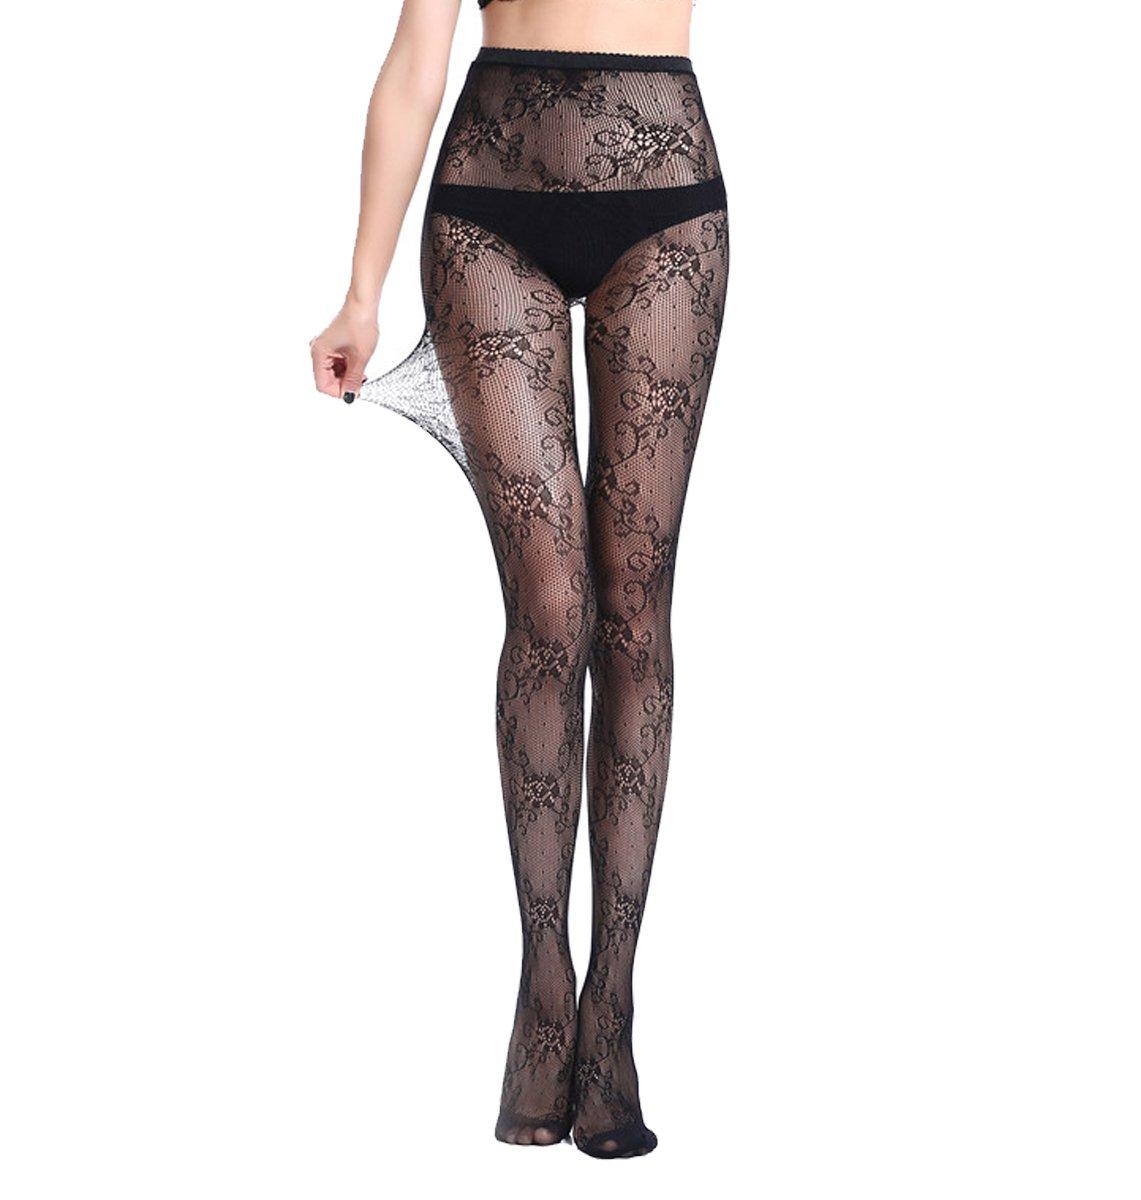 Nets Pantyhose Women's Fishnet Lace Panty Hose Jacquard Weave Stocking Lingerie